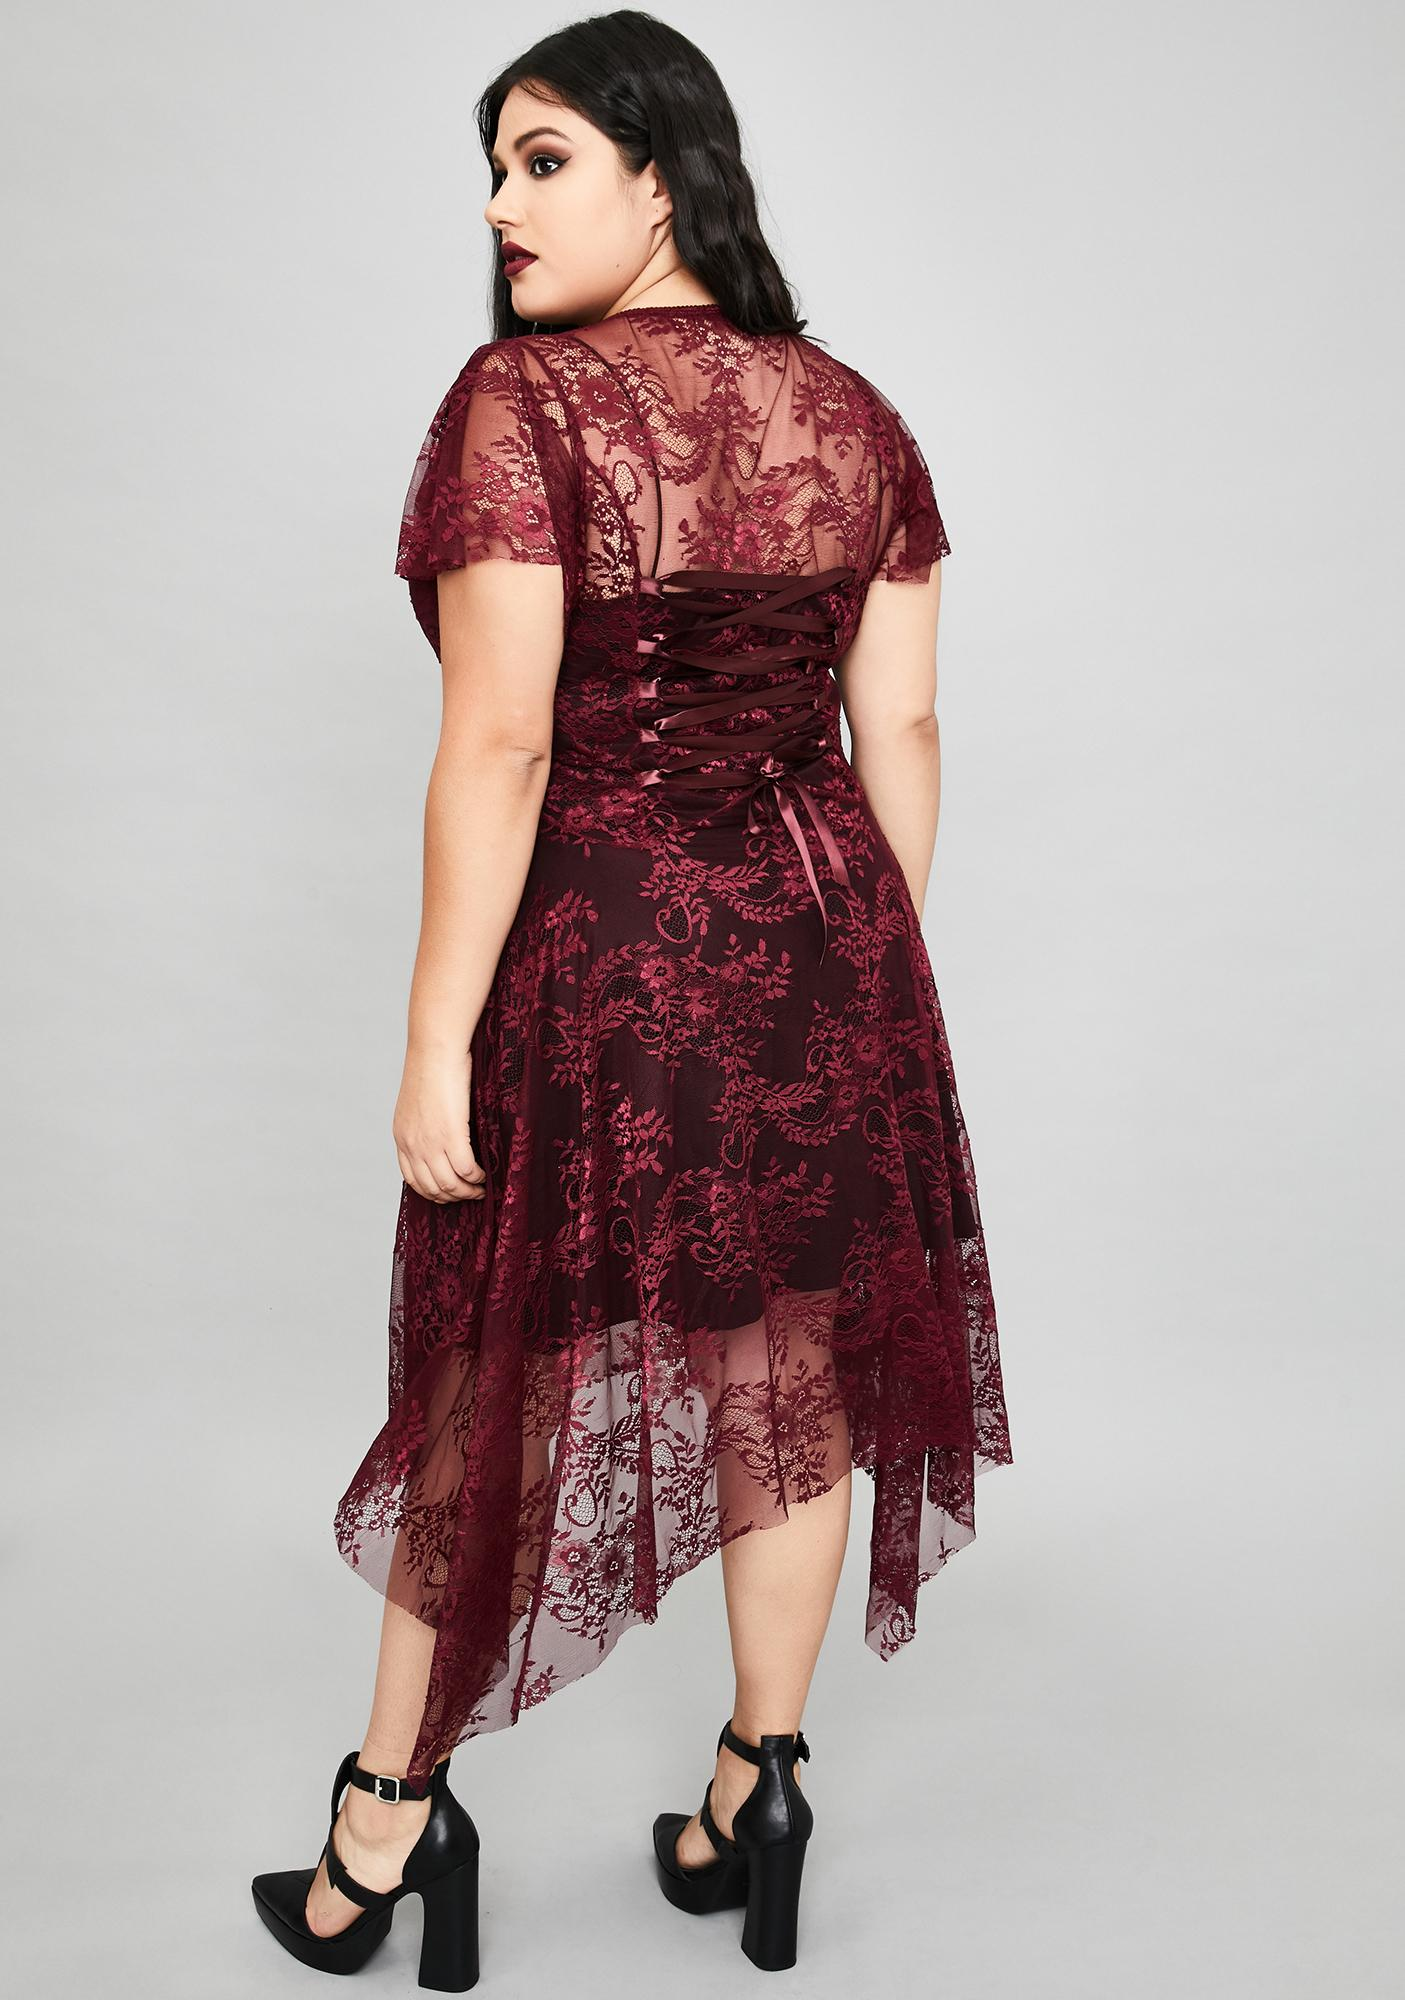 Widow Wine So Dearly Departed Lace Dress